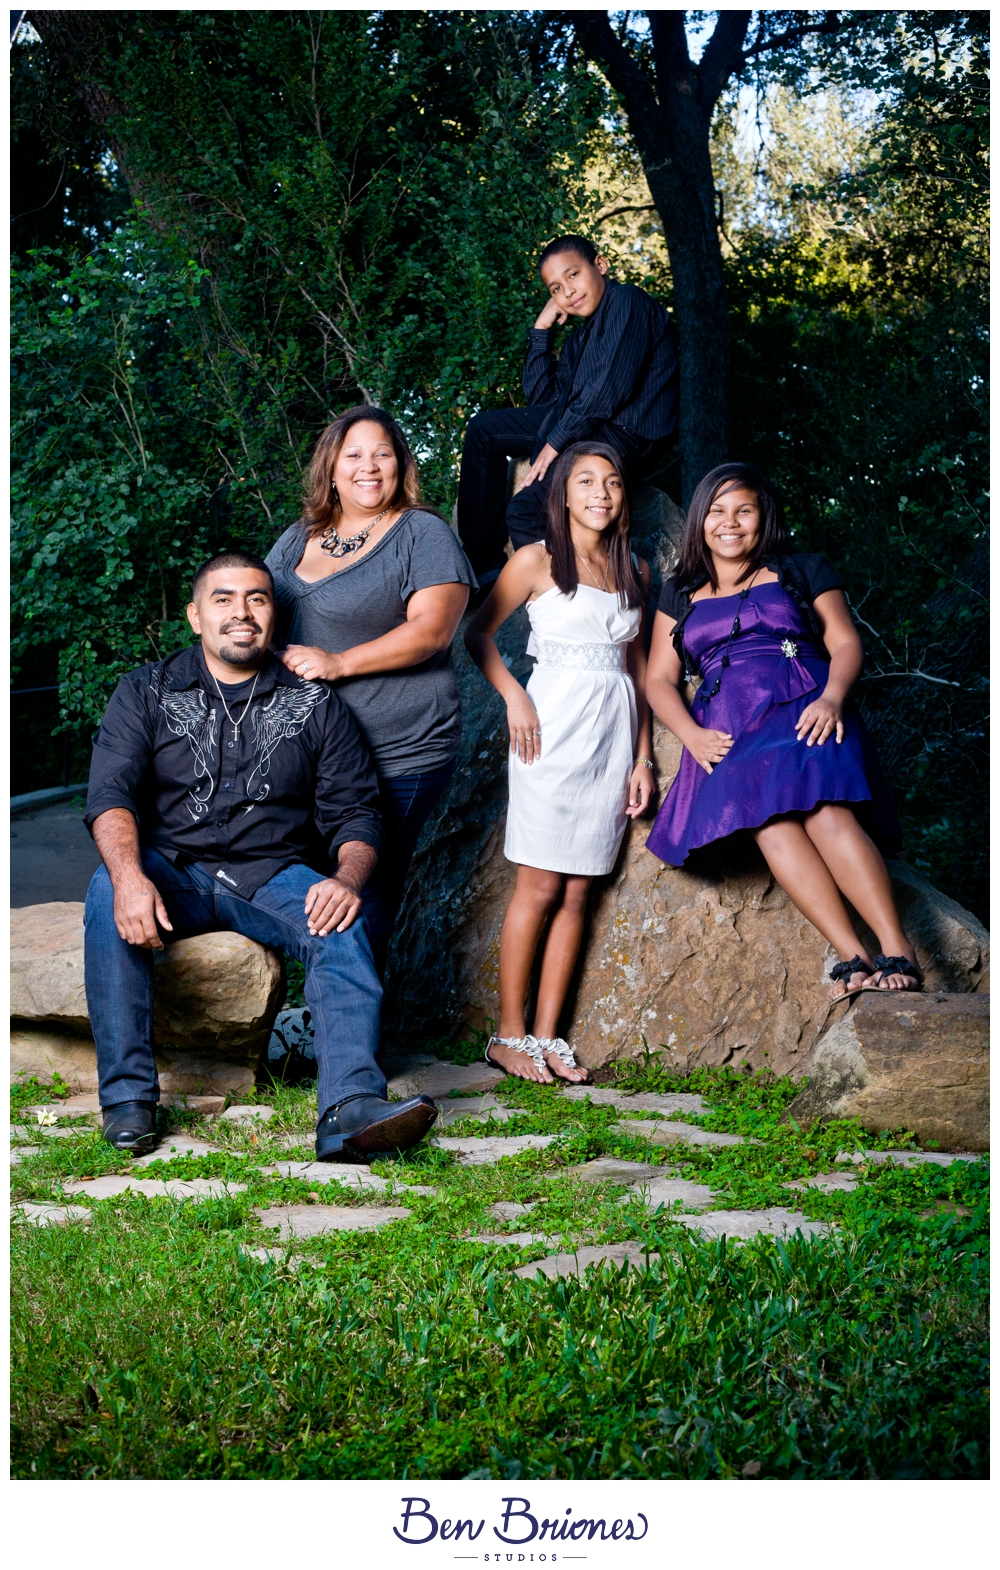 Benoni Nunez Family_PRINT_BBP-284_FB